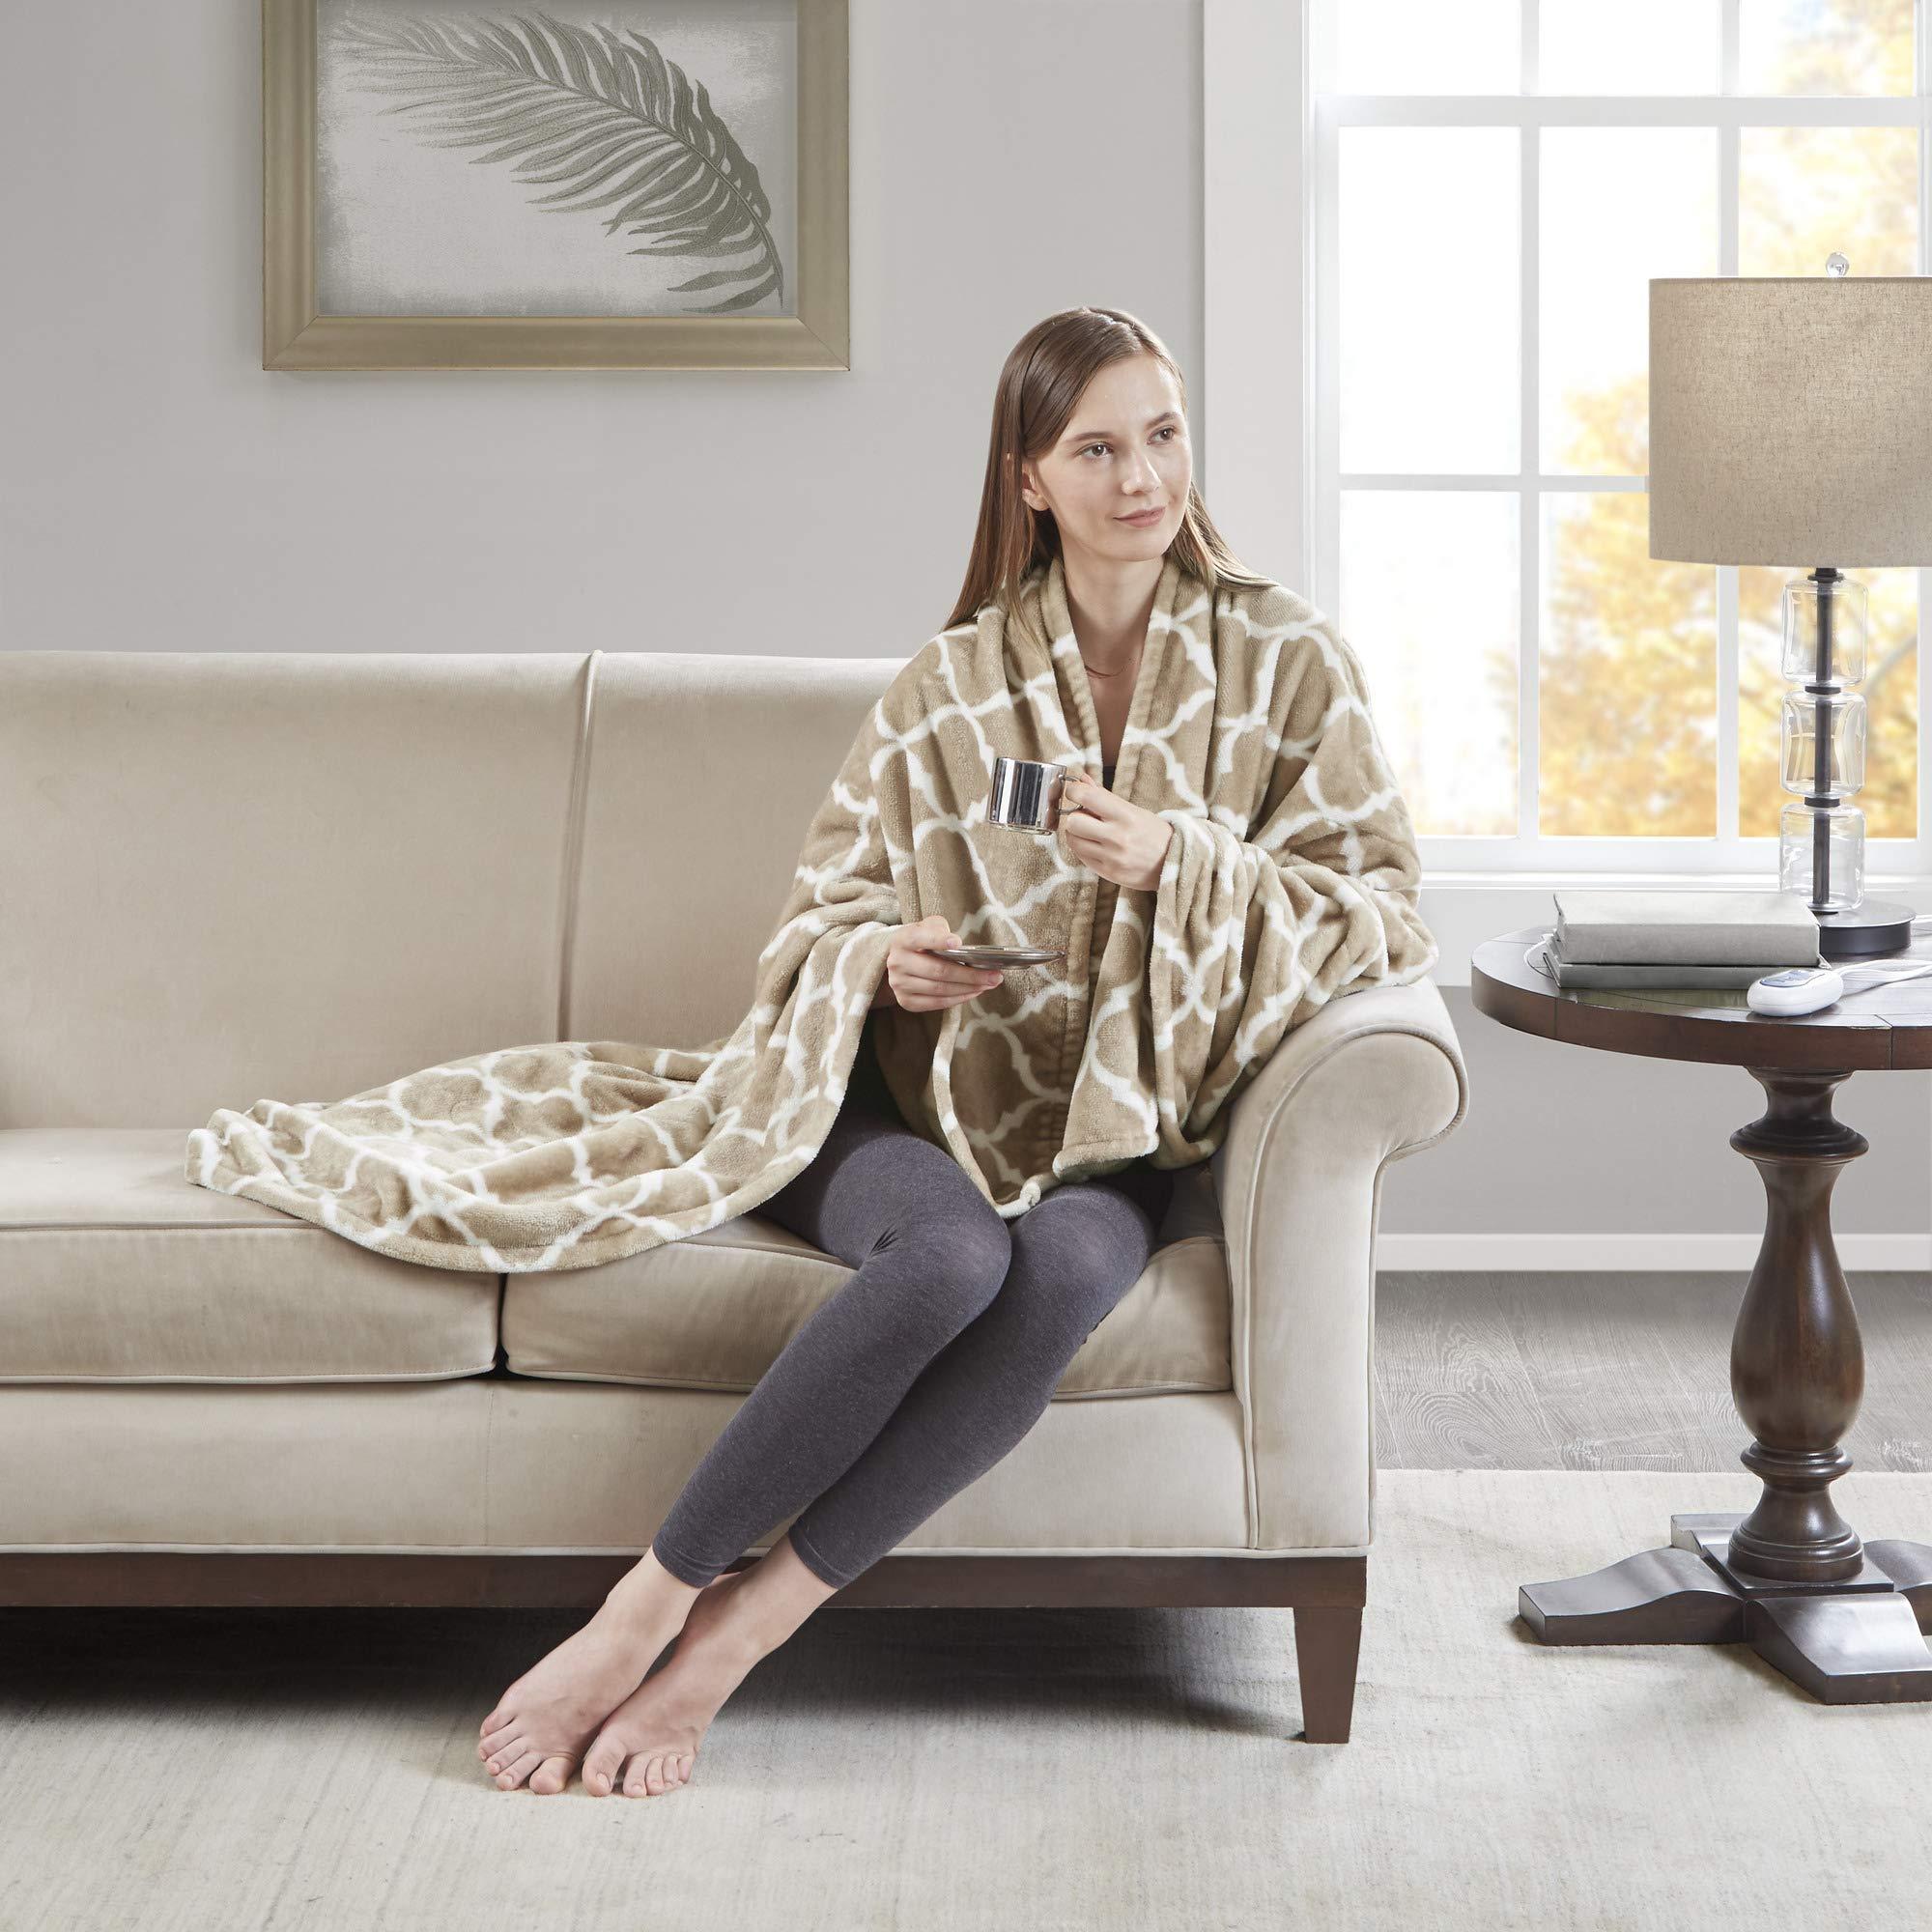 Free Fleece Poncho Pattern – Design Patterns